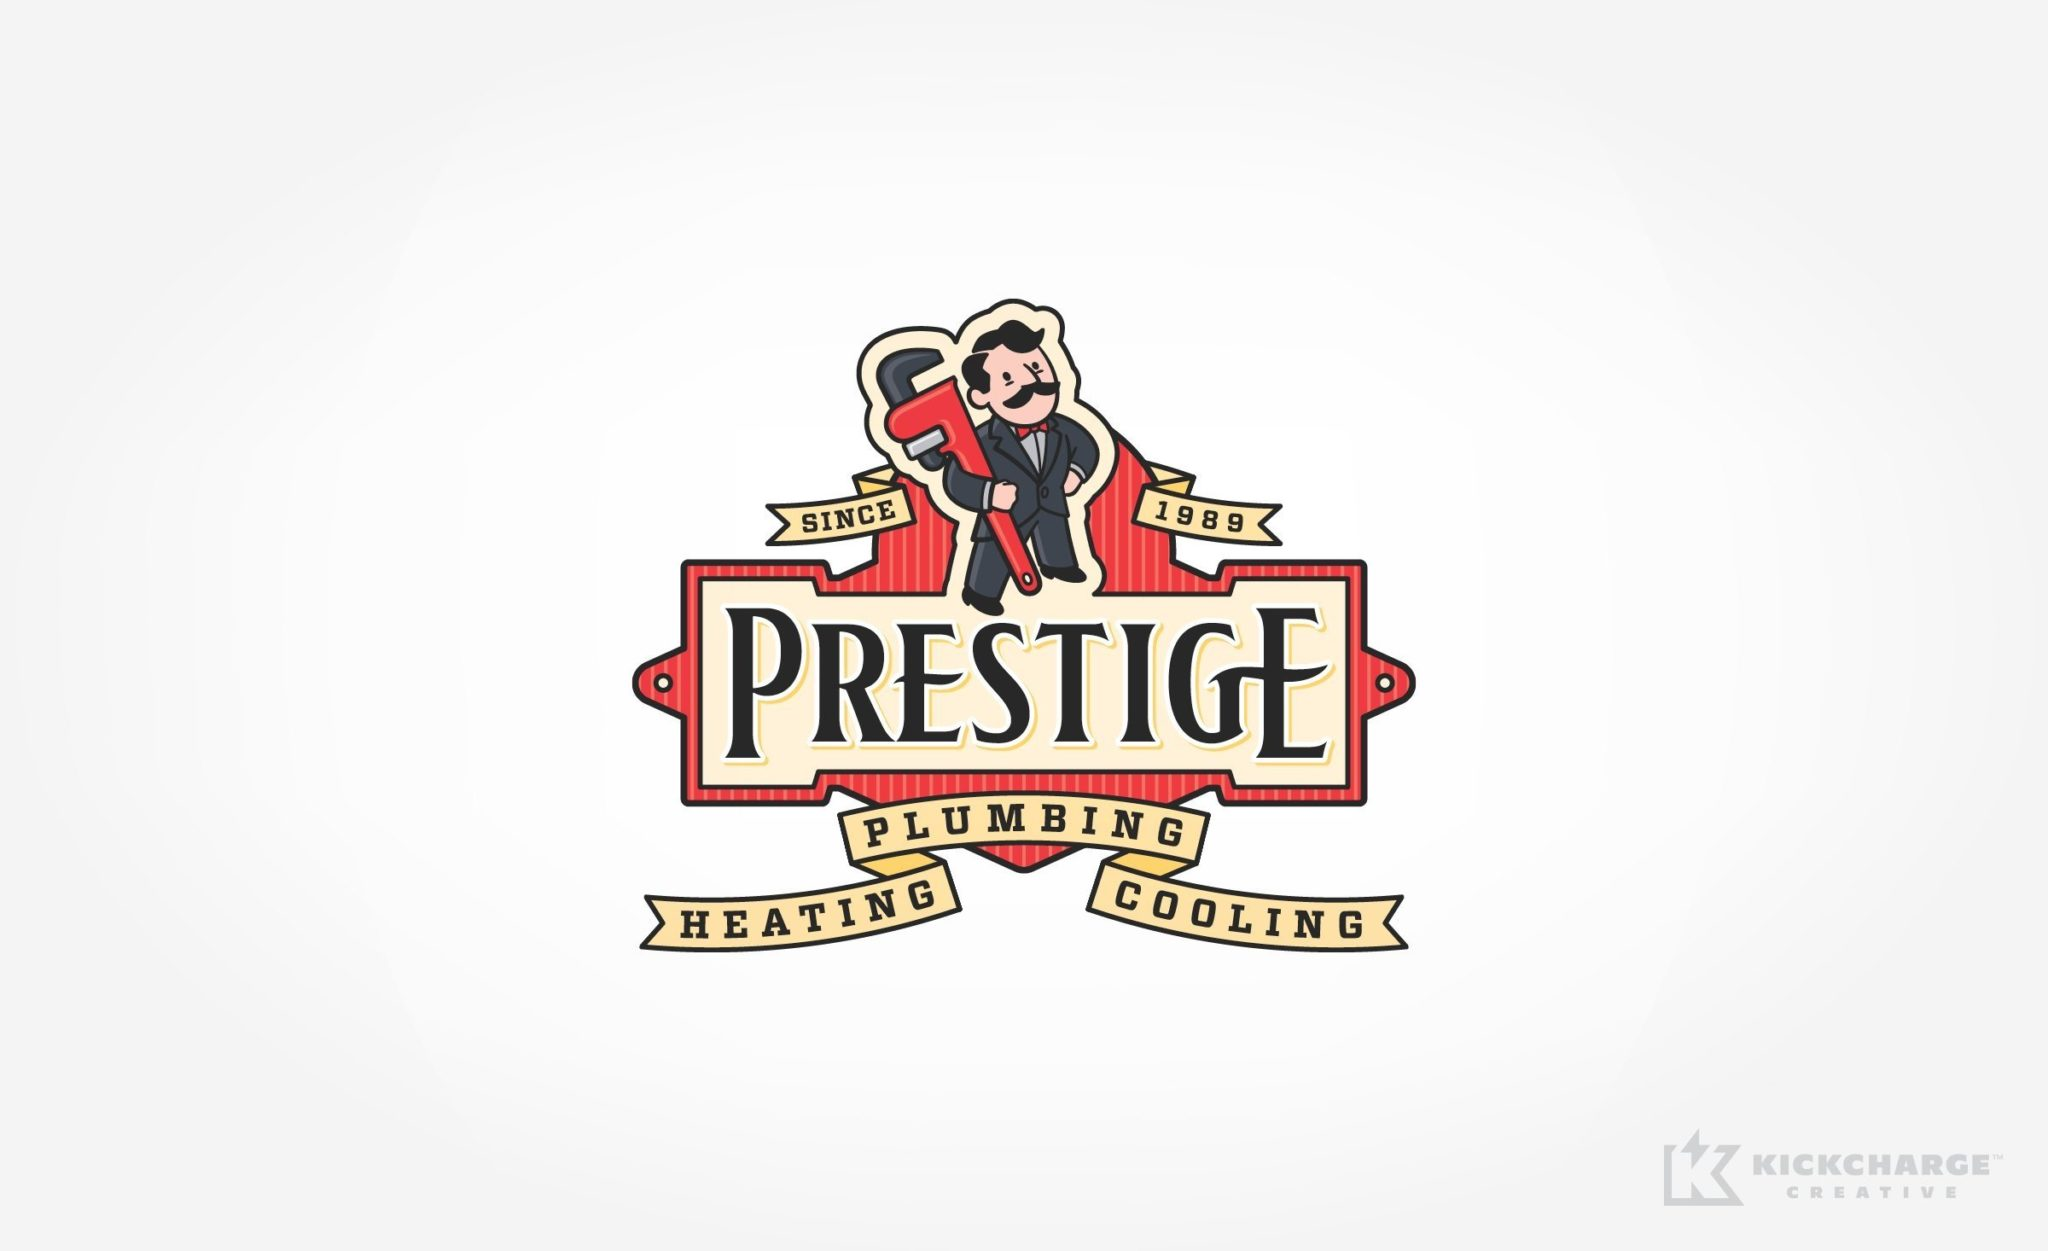 Prestige Plumbing Heating  Cooling  KickCharge Creative